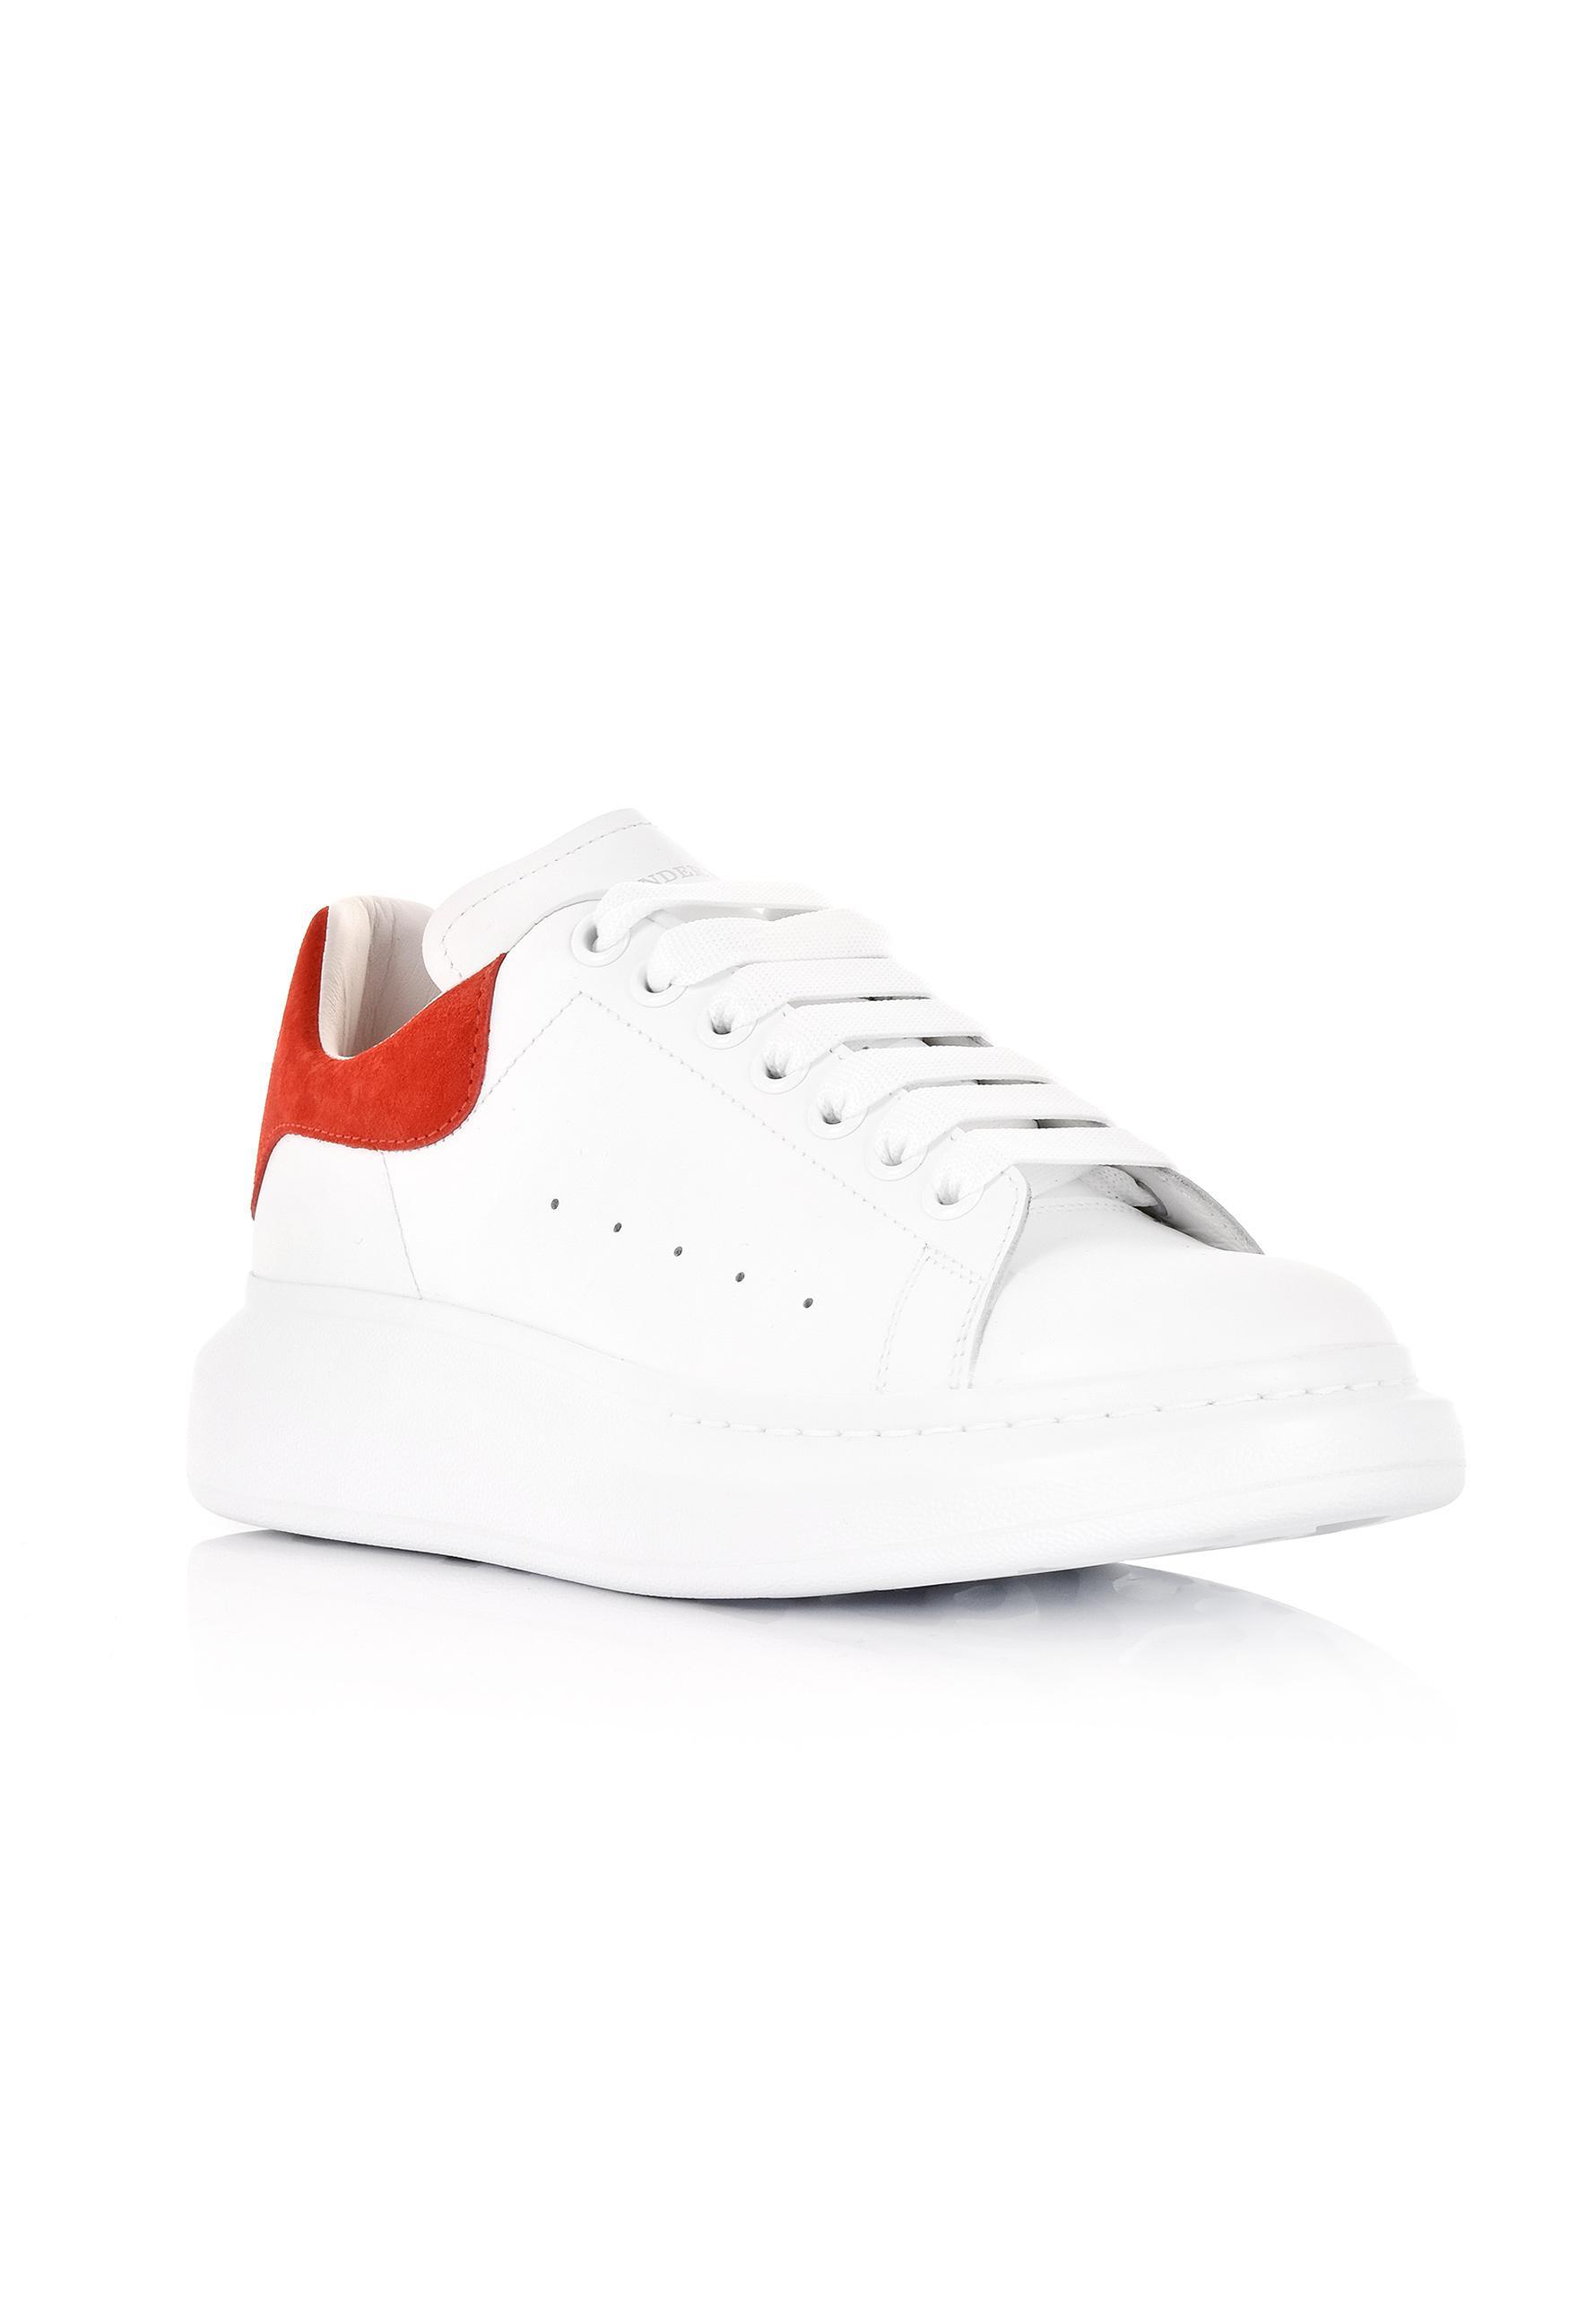 cca8d83ed503 Alexander McQueen Men s Oversized Sneakers White red in White for ...